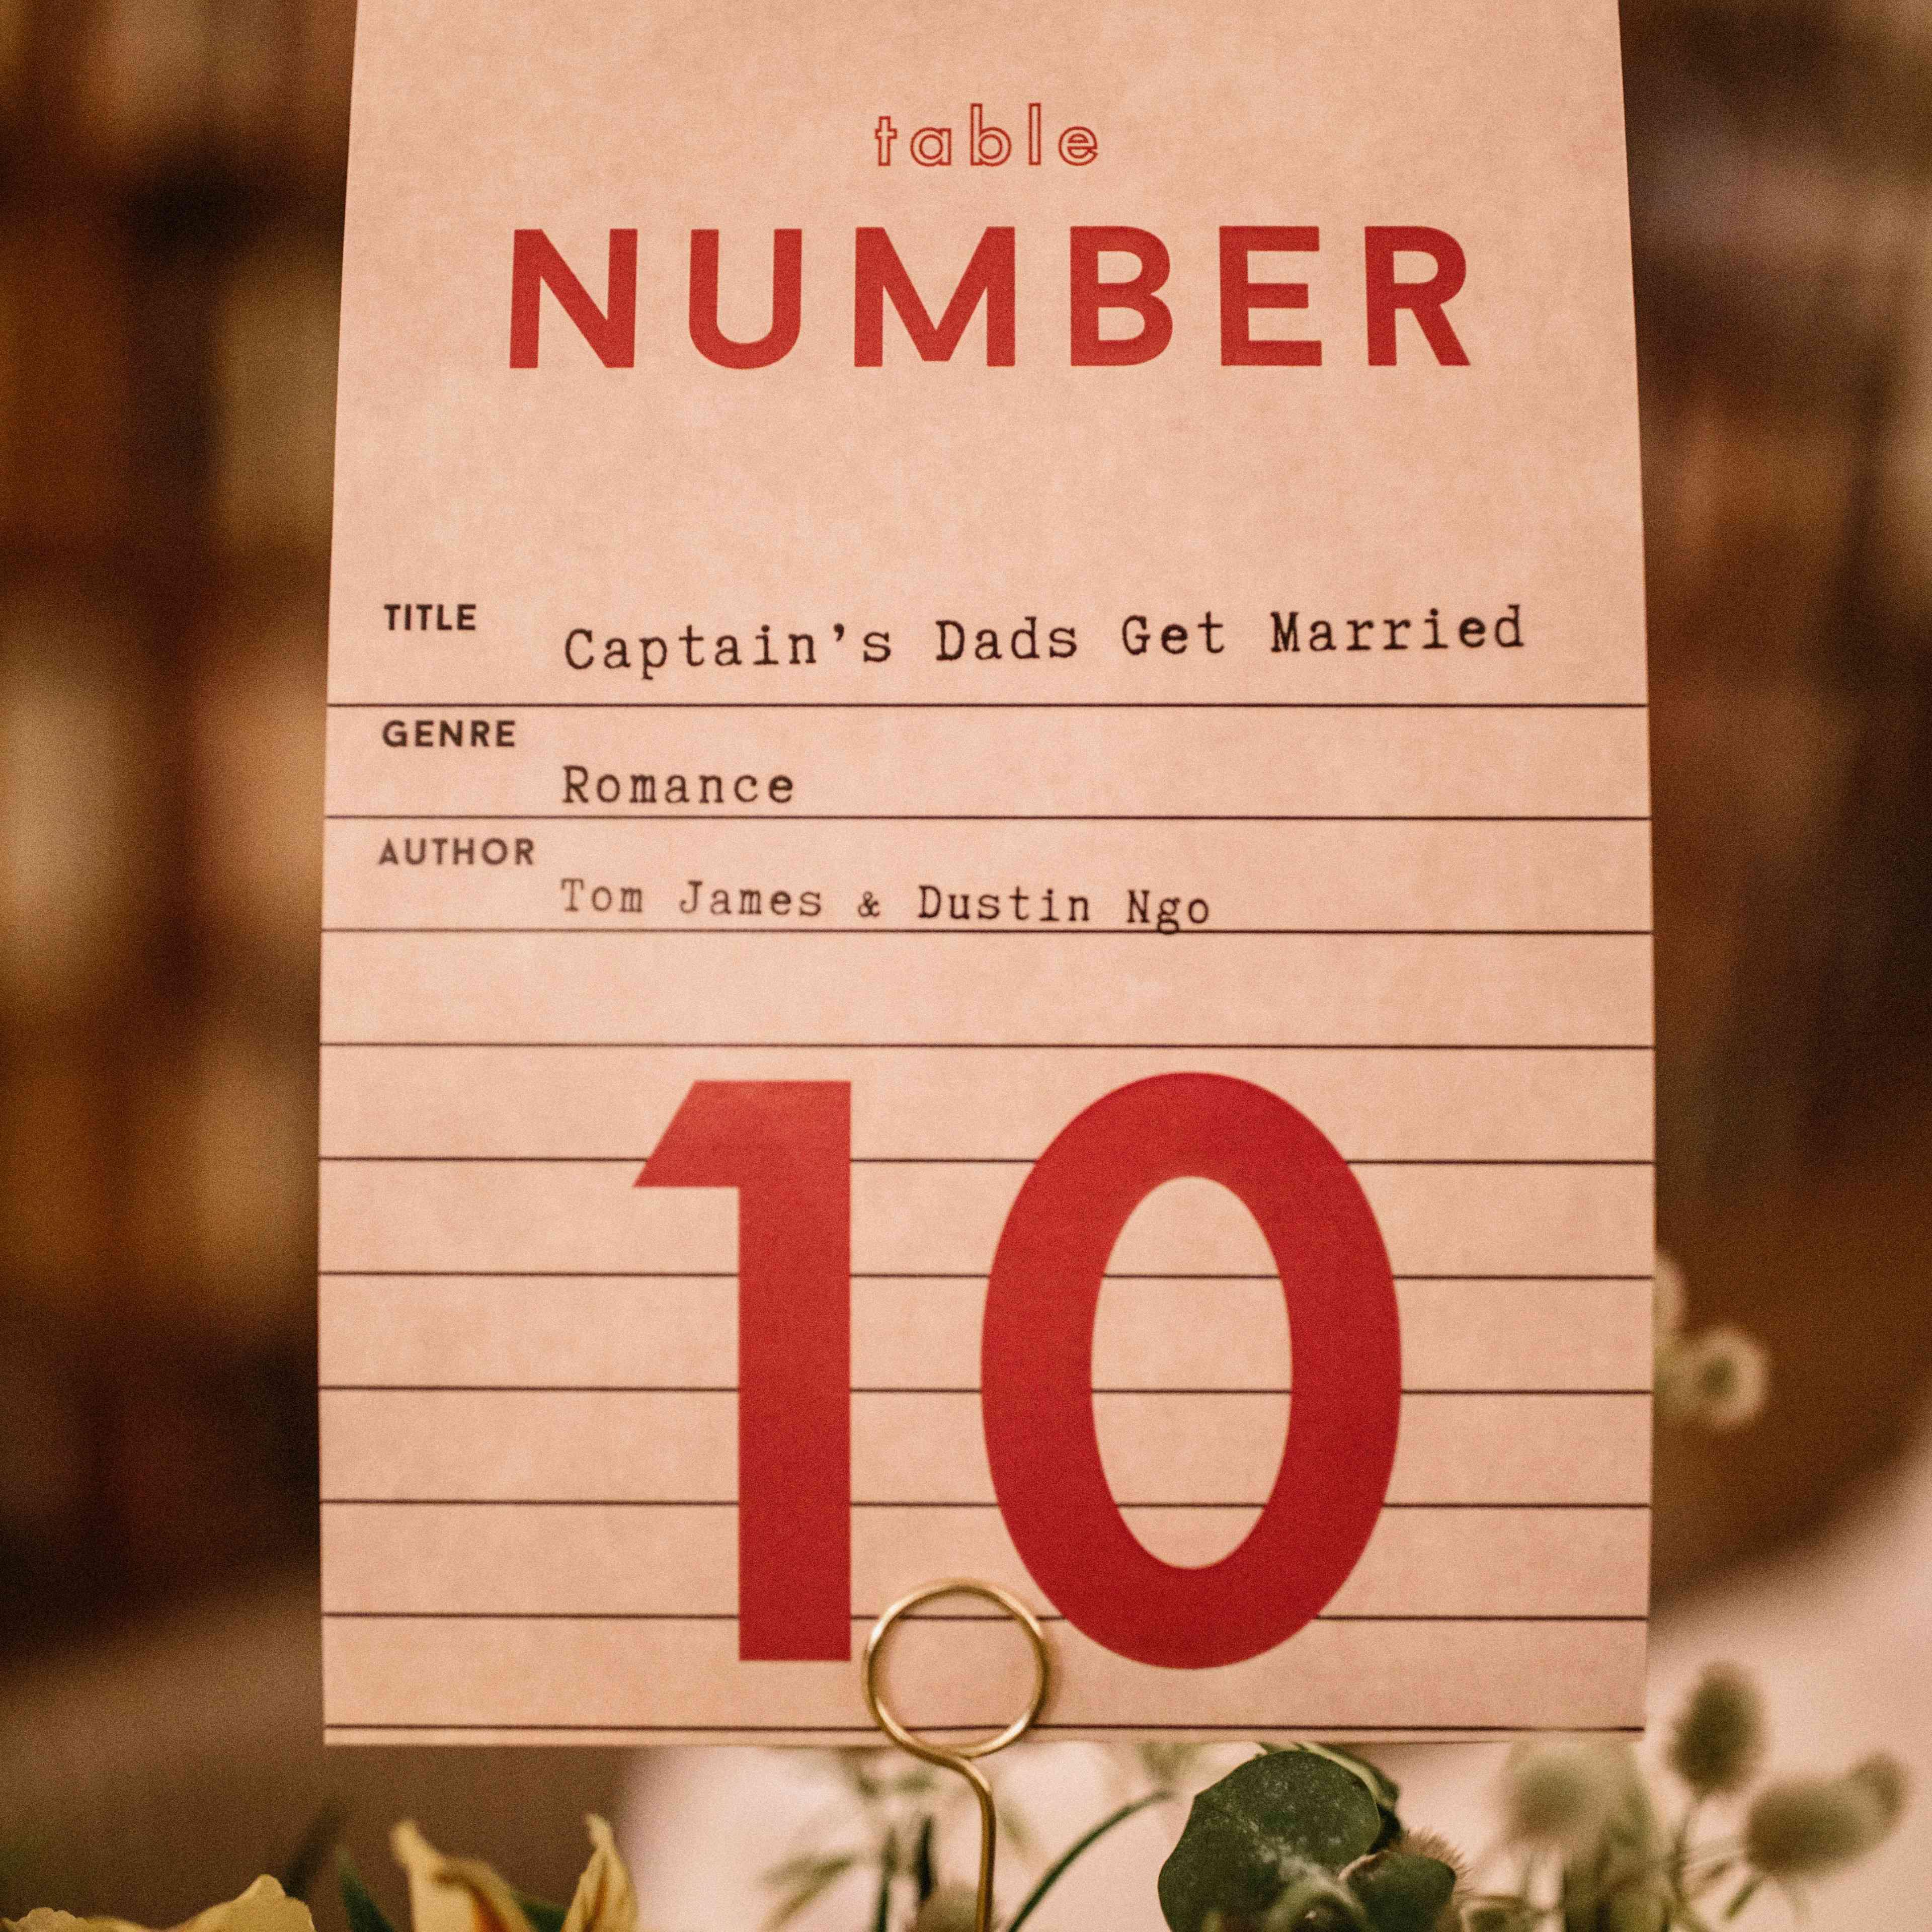 Book table number closeup